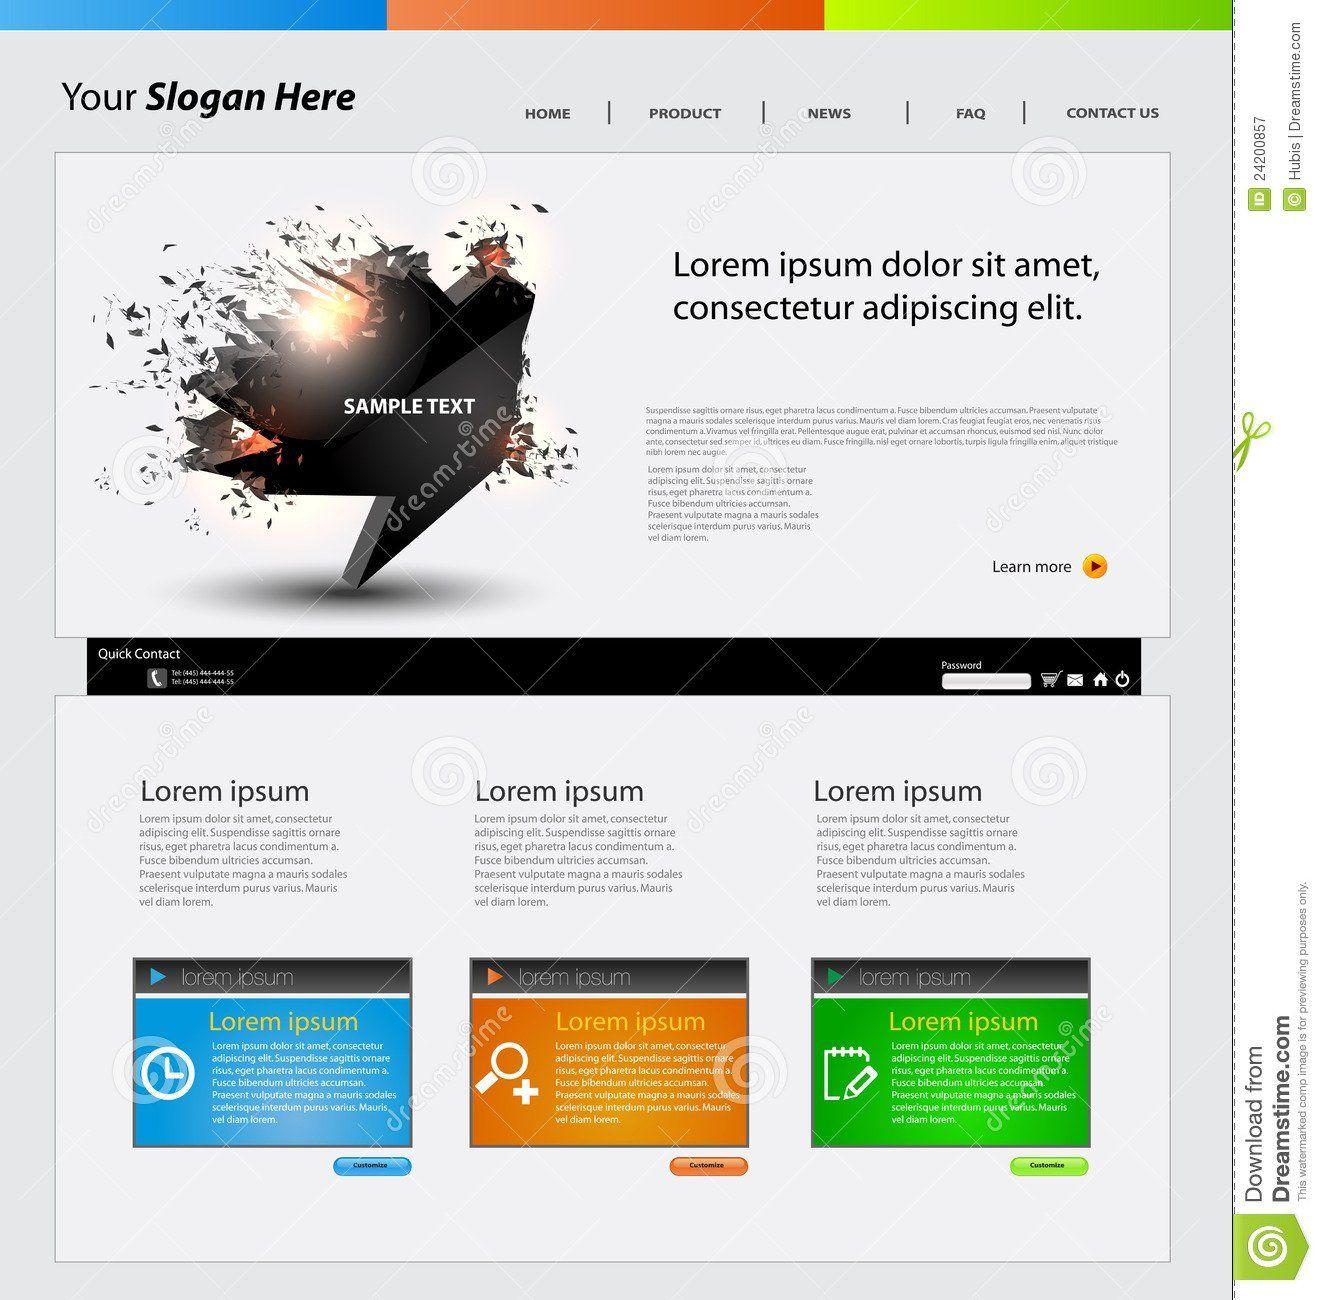 Top 20 Ecommerce Website Design Firm In Singapore In 2020 Web Design Ecommerce Website Design Web Template Design